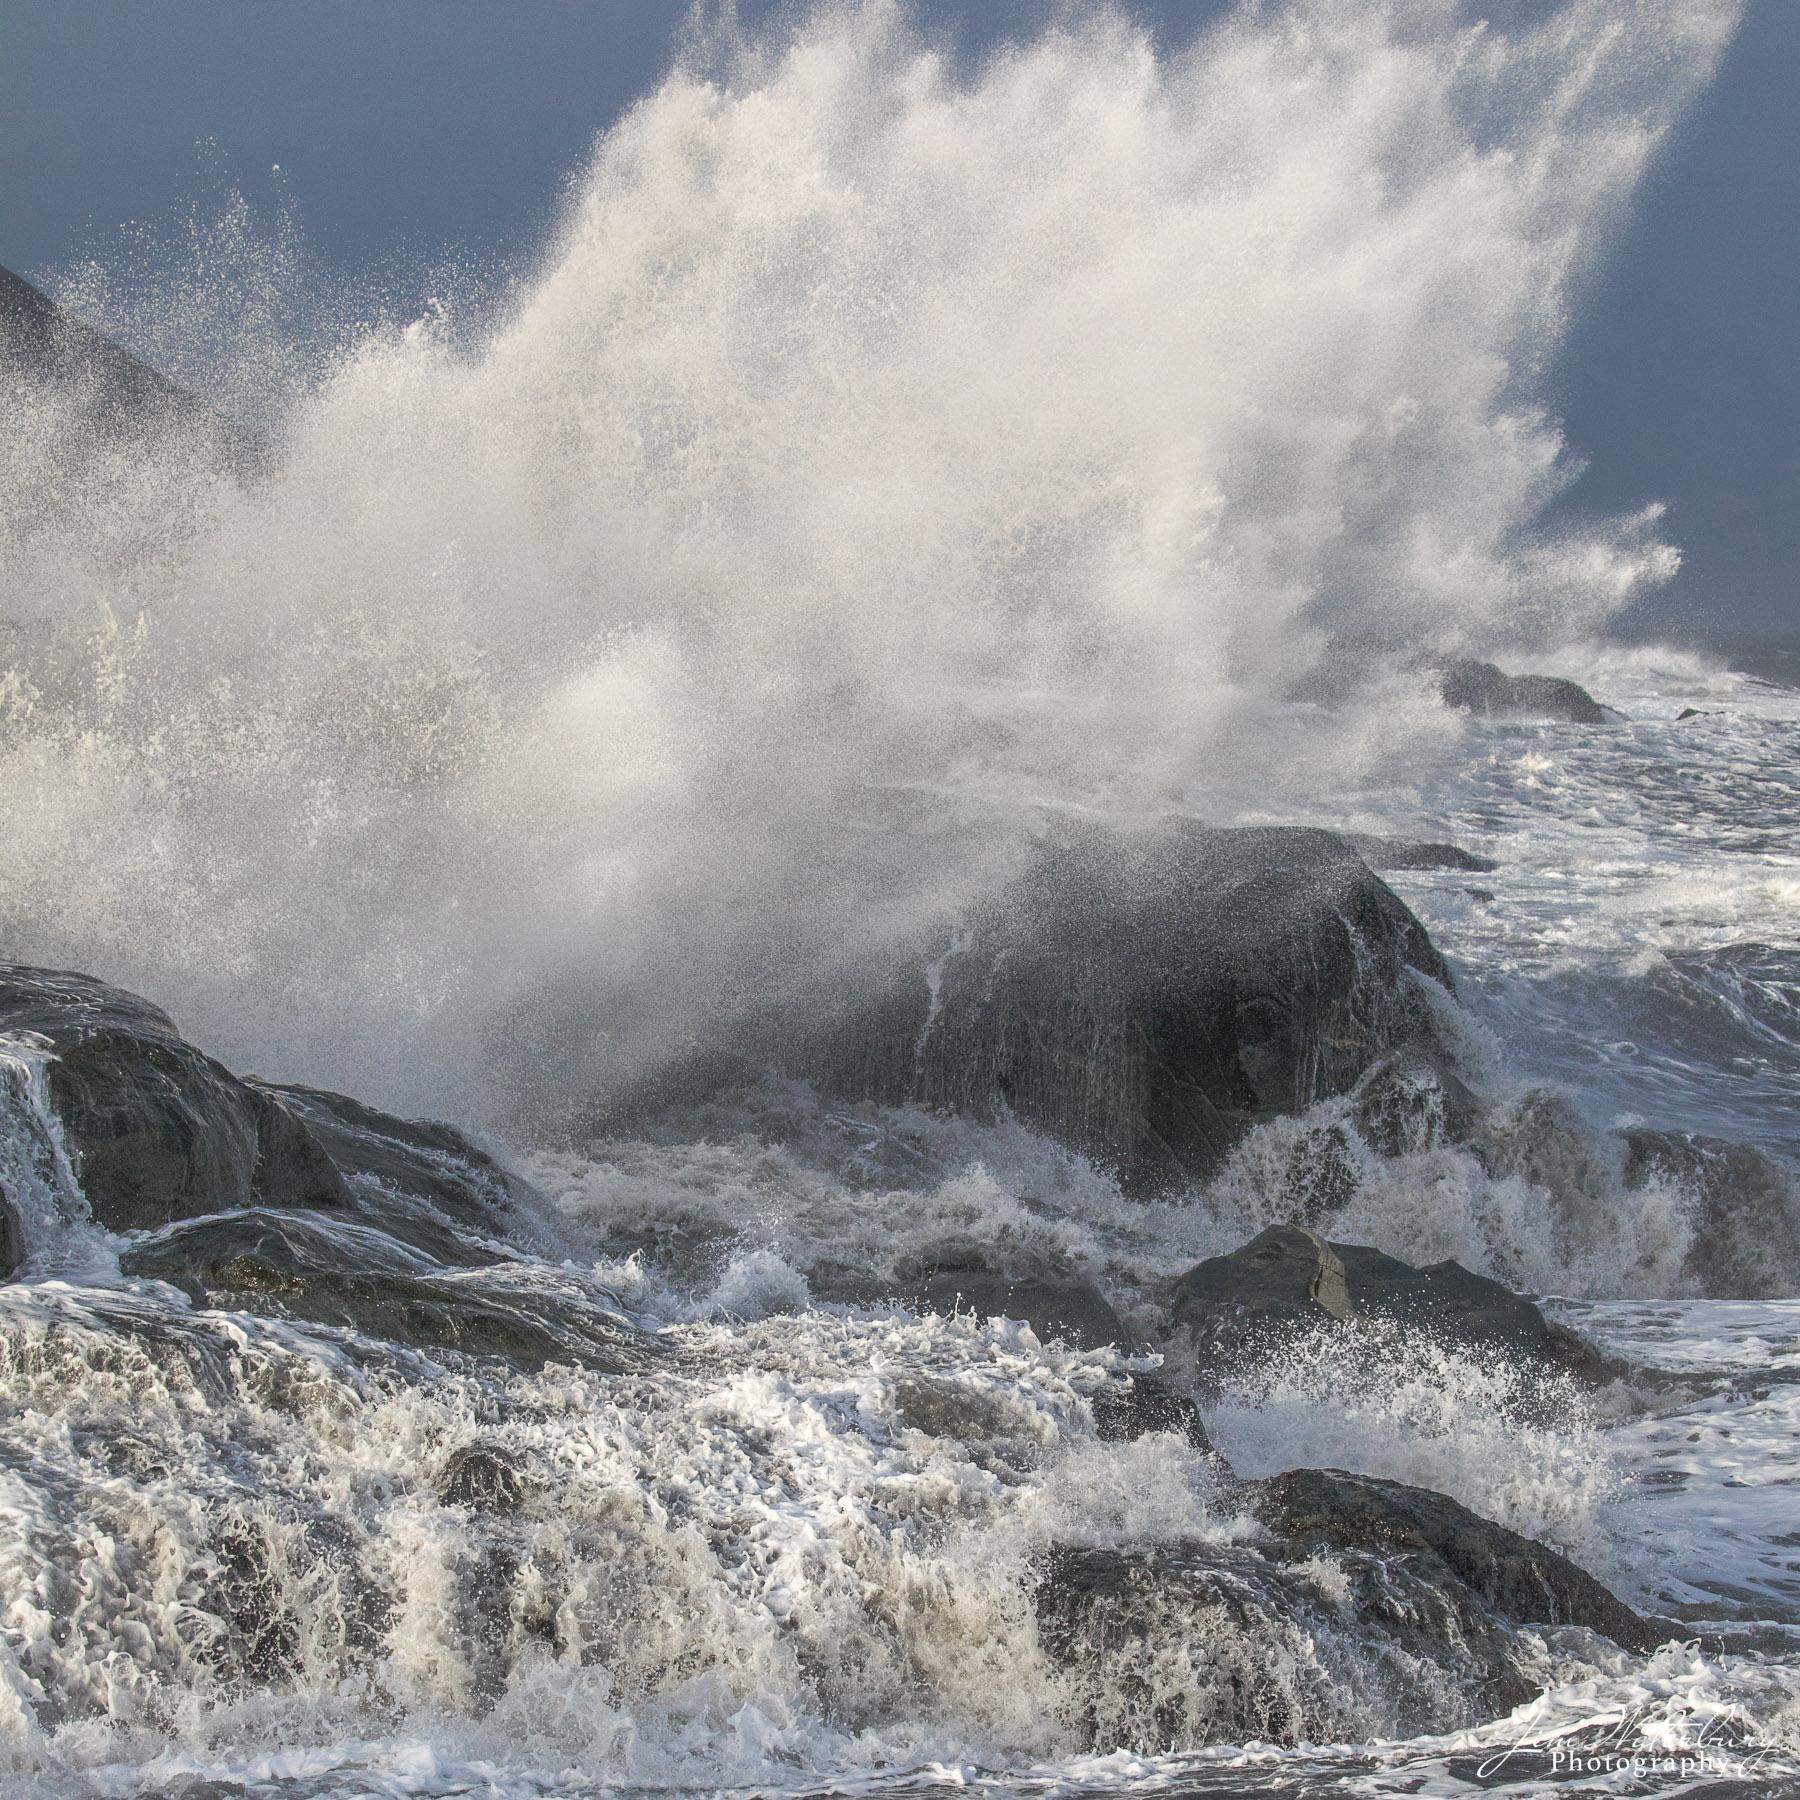 Iceland, ocean, surf, rocks, photo